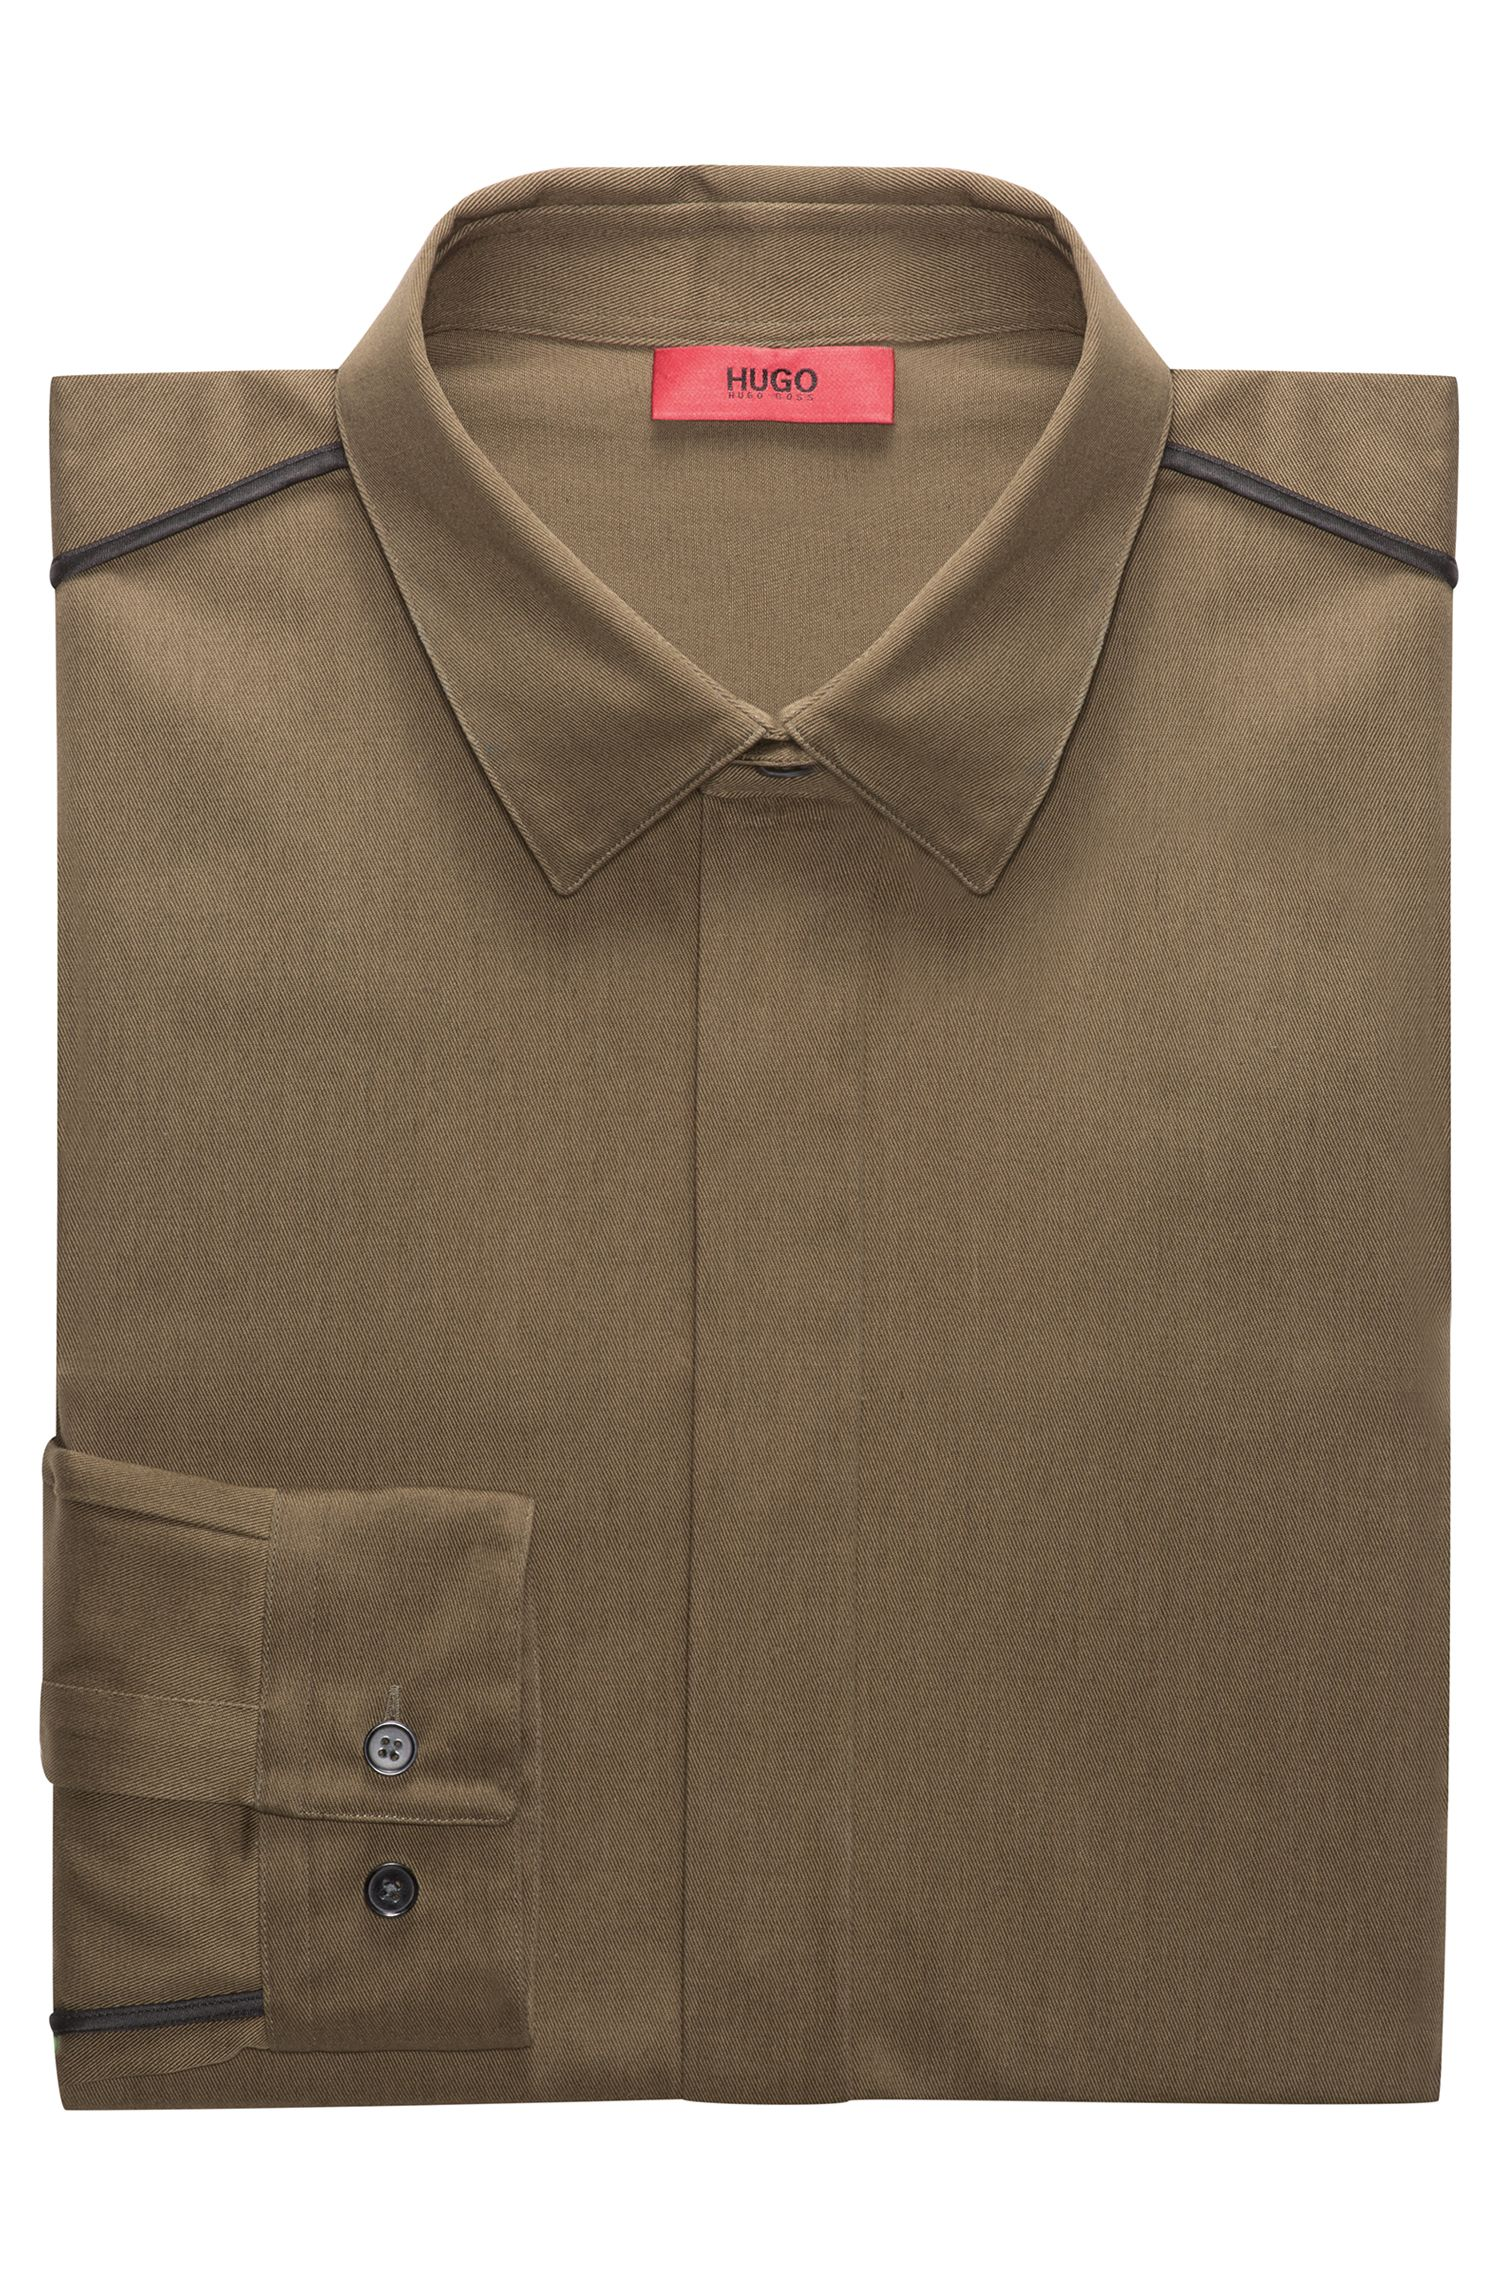 Relaxed-Fit Hemd aus Baumwolle mit kontrastfarbenen Paspeln